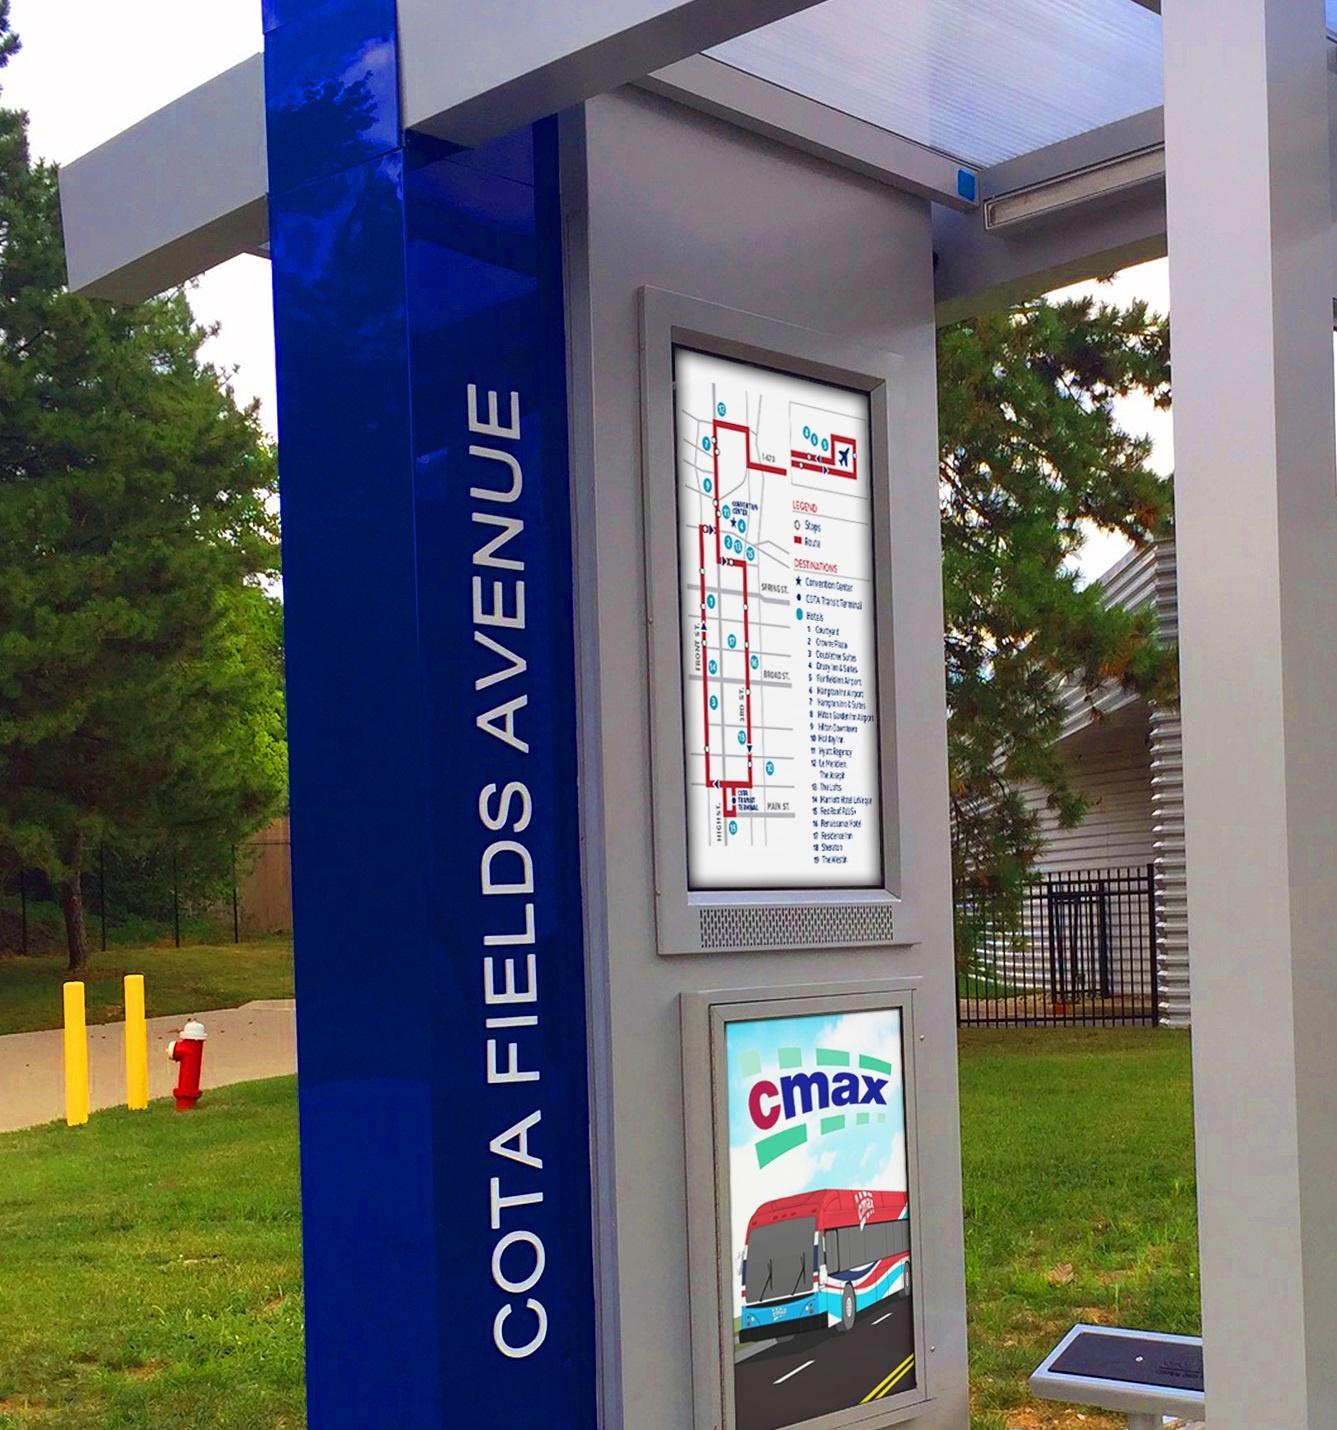 COTA digital signage outdoor lcd enclosure viewstation itsenclosures.jpg